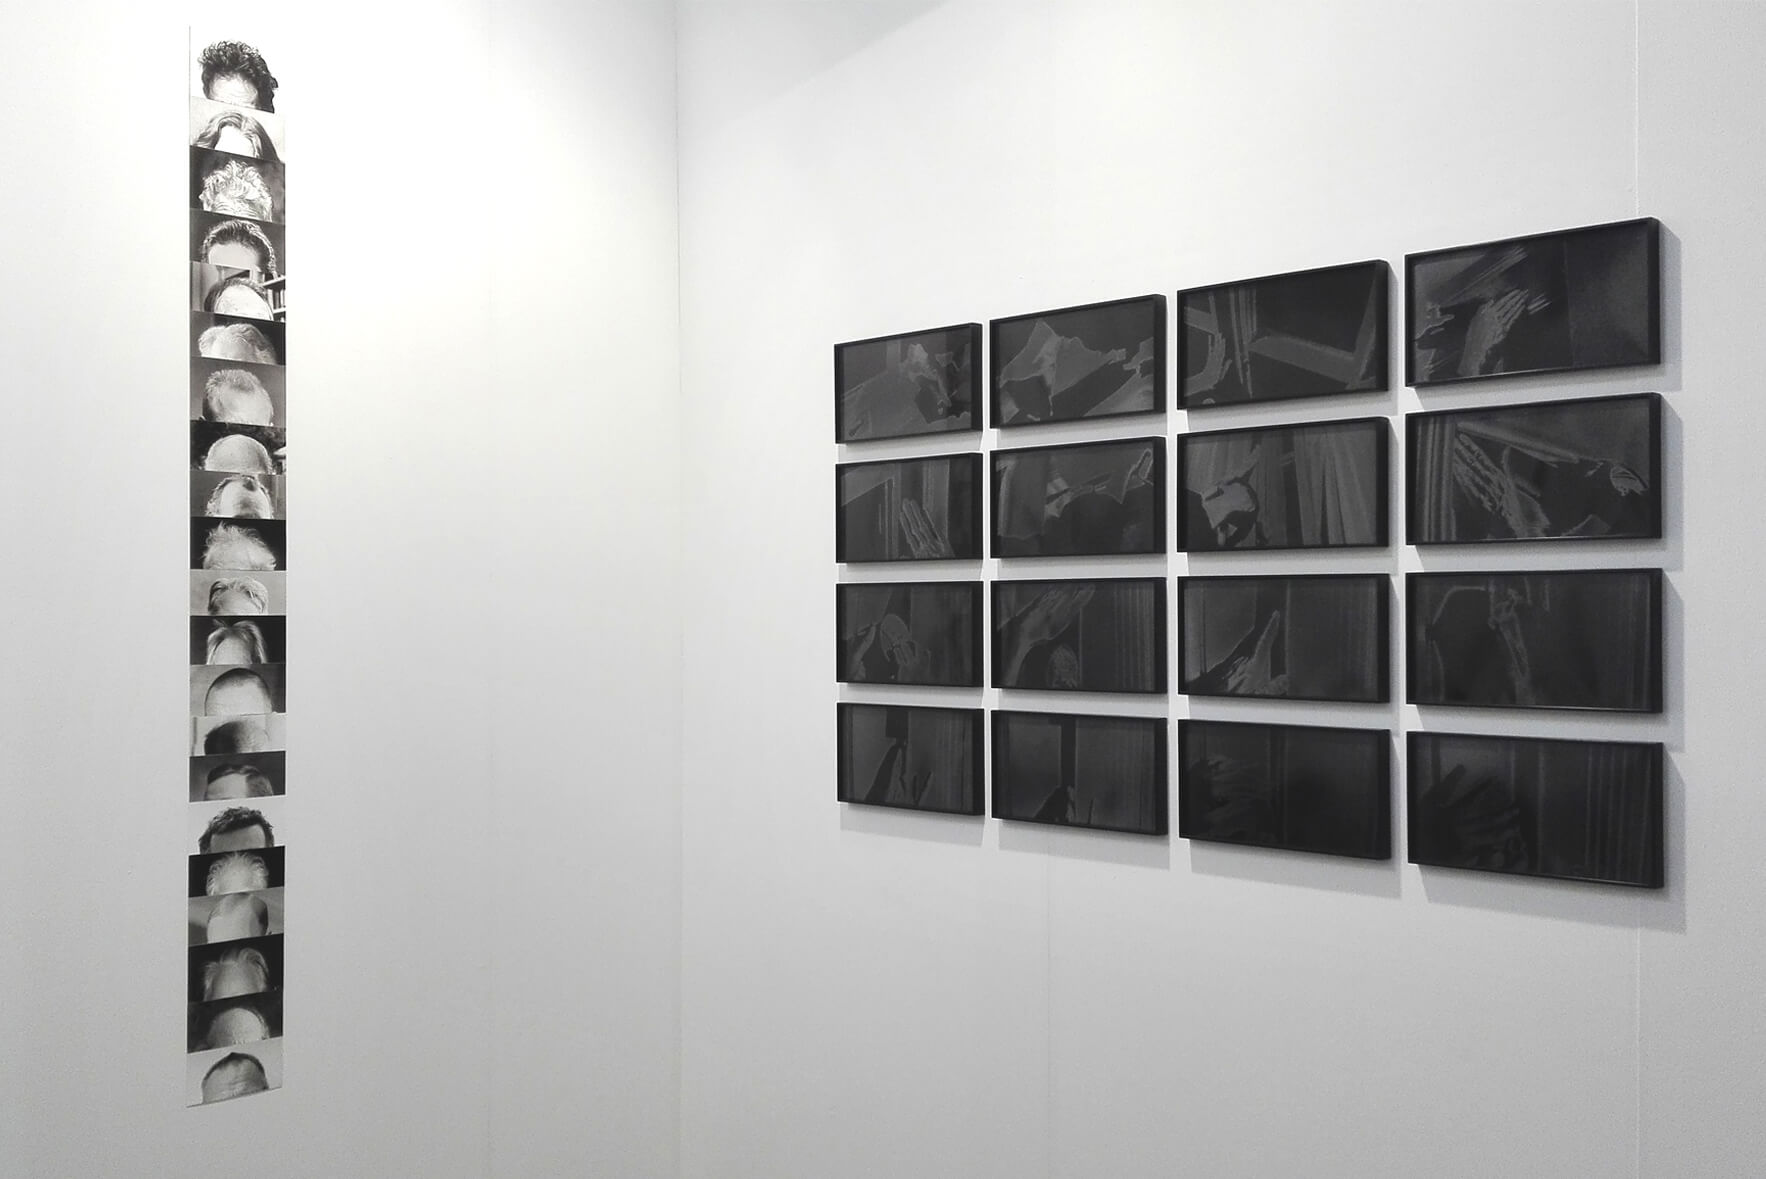 Installation view: ProjecteSD, Booth PF09 | ARTISSIMA 2016 | ProjecteSD